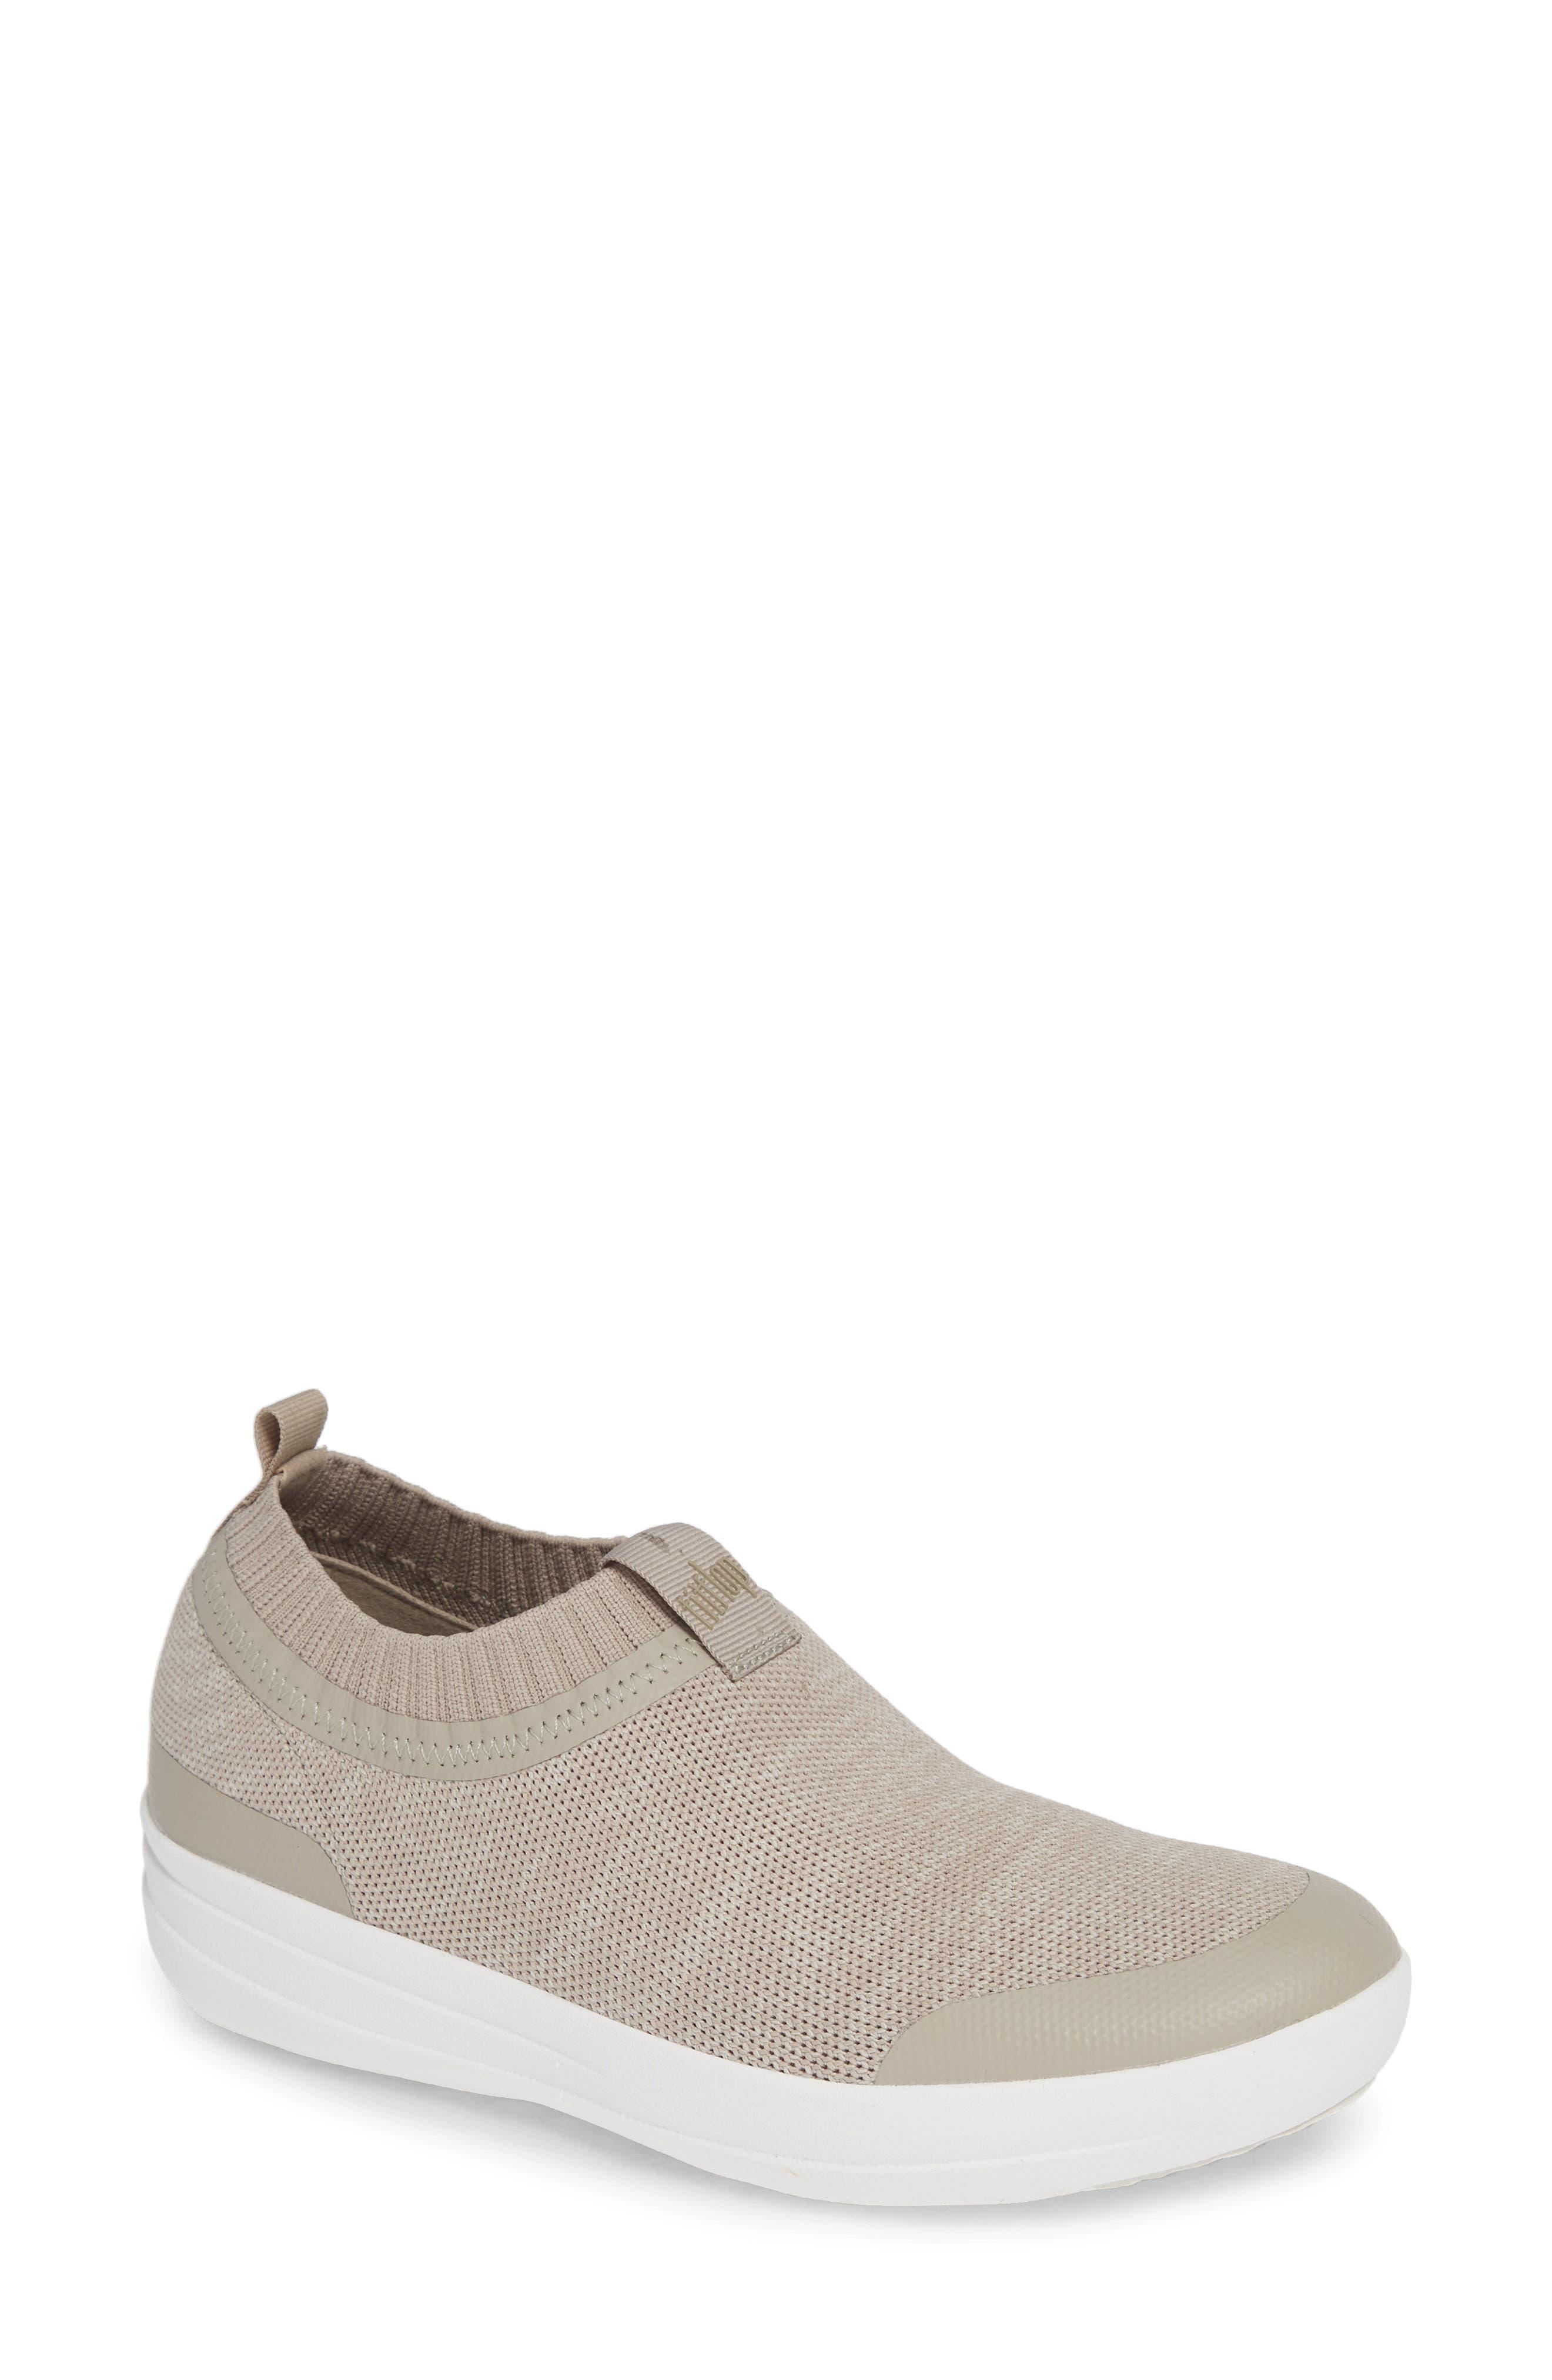 FITFLOP, Uberknit Slip-On Sneaker, Main thumbnail 1, color, 256